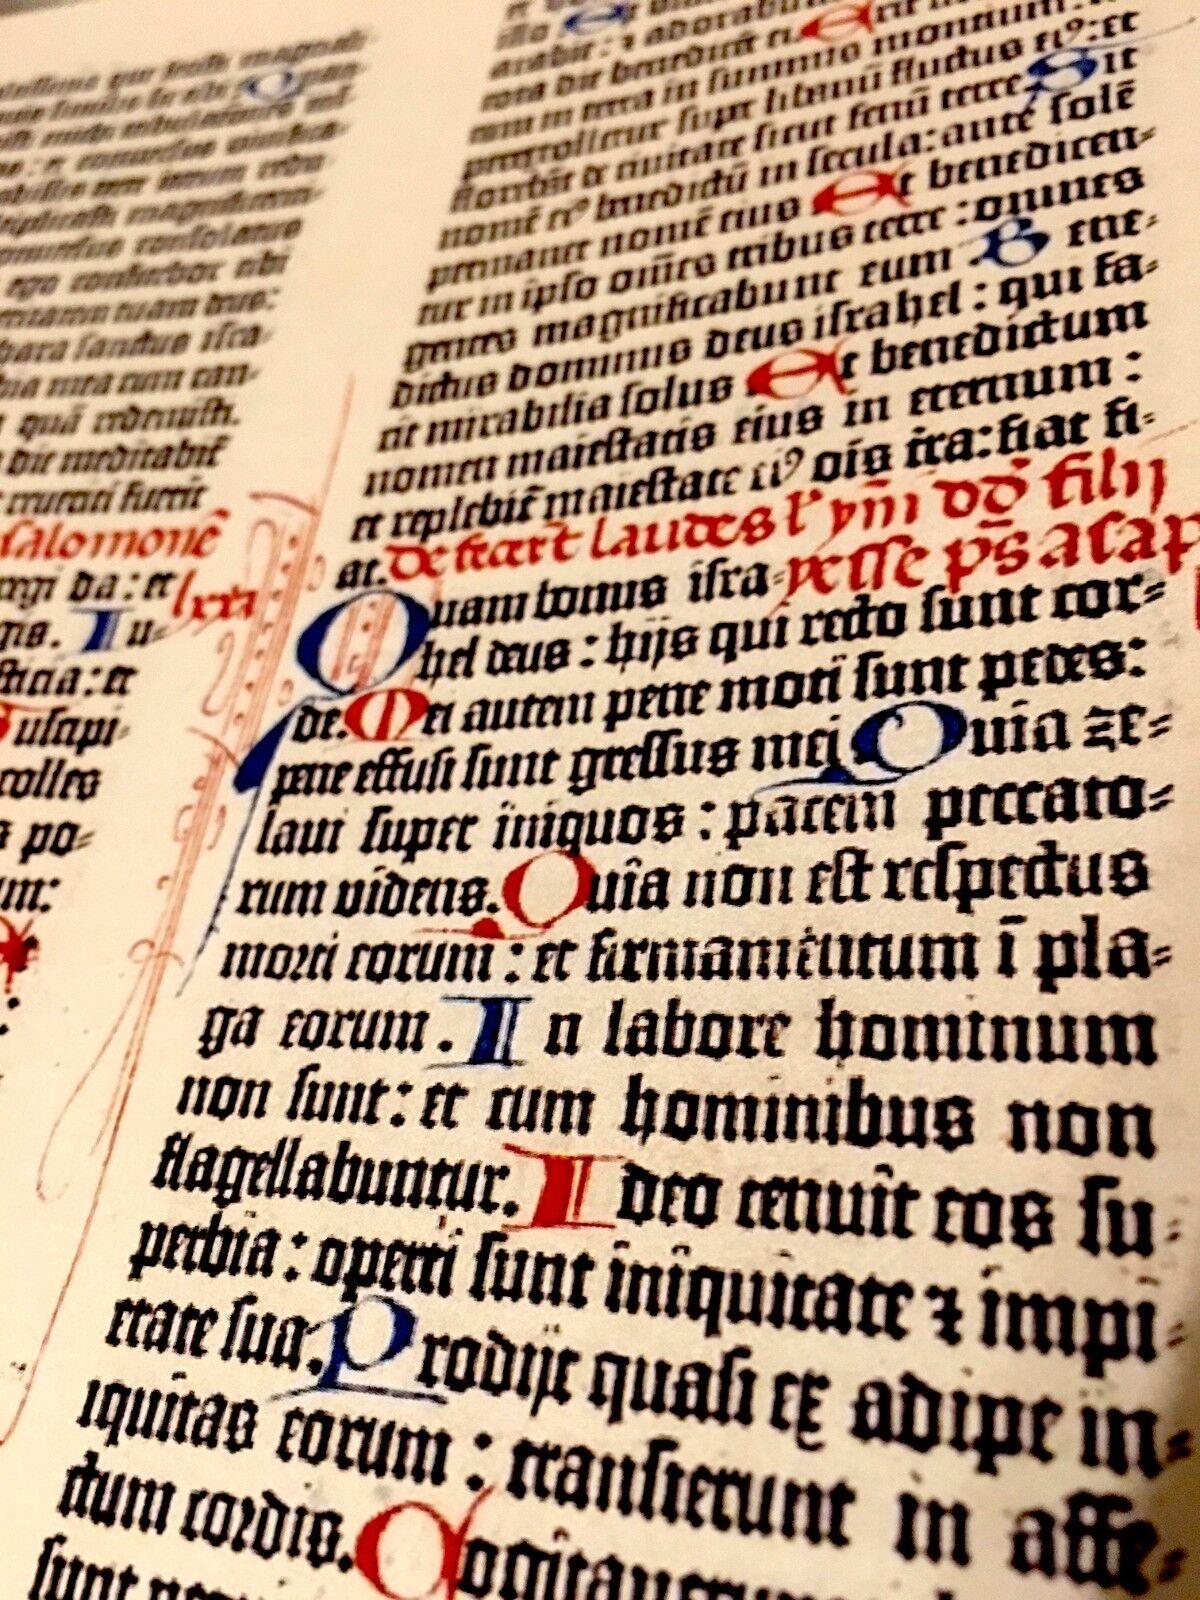 Gutenberg Bible, Bavarian State Library version, Facsimile